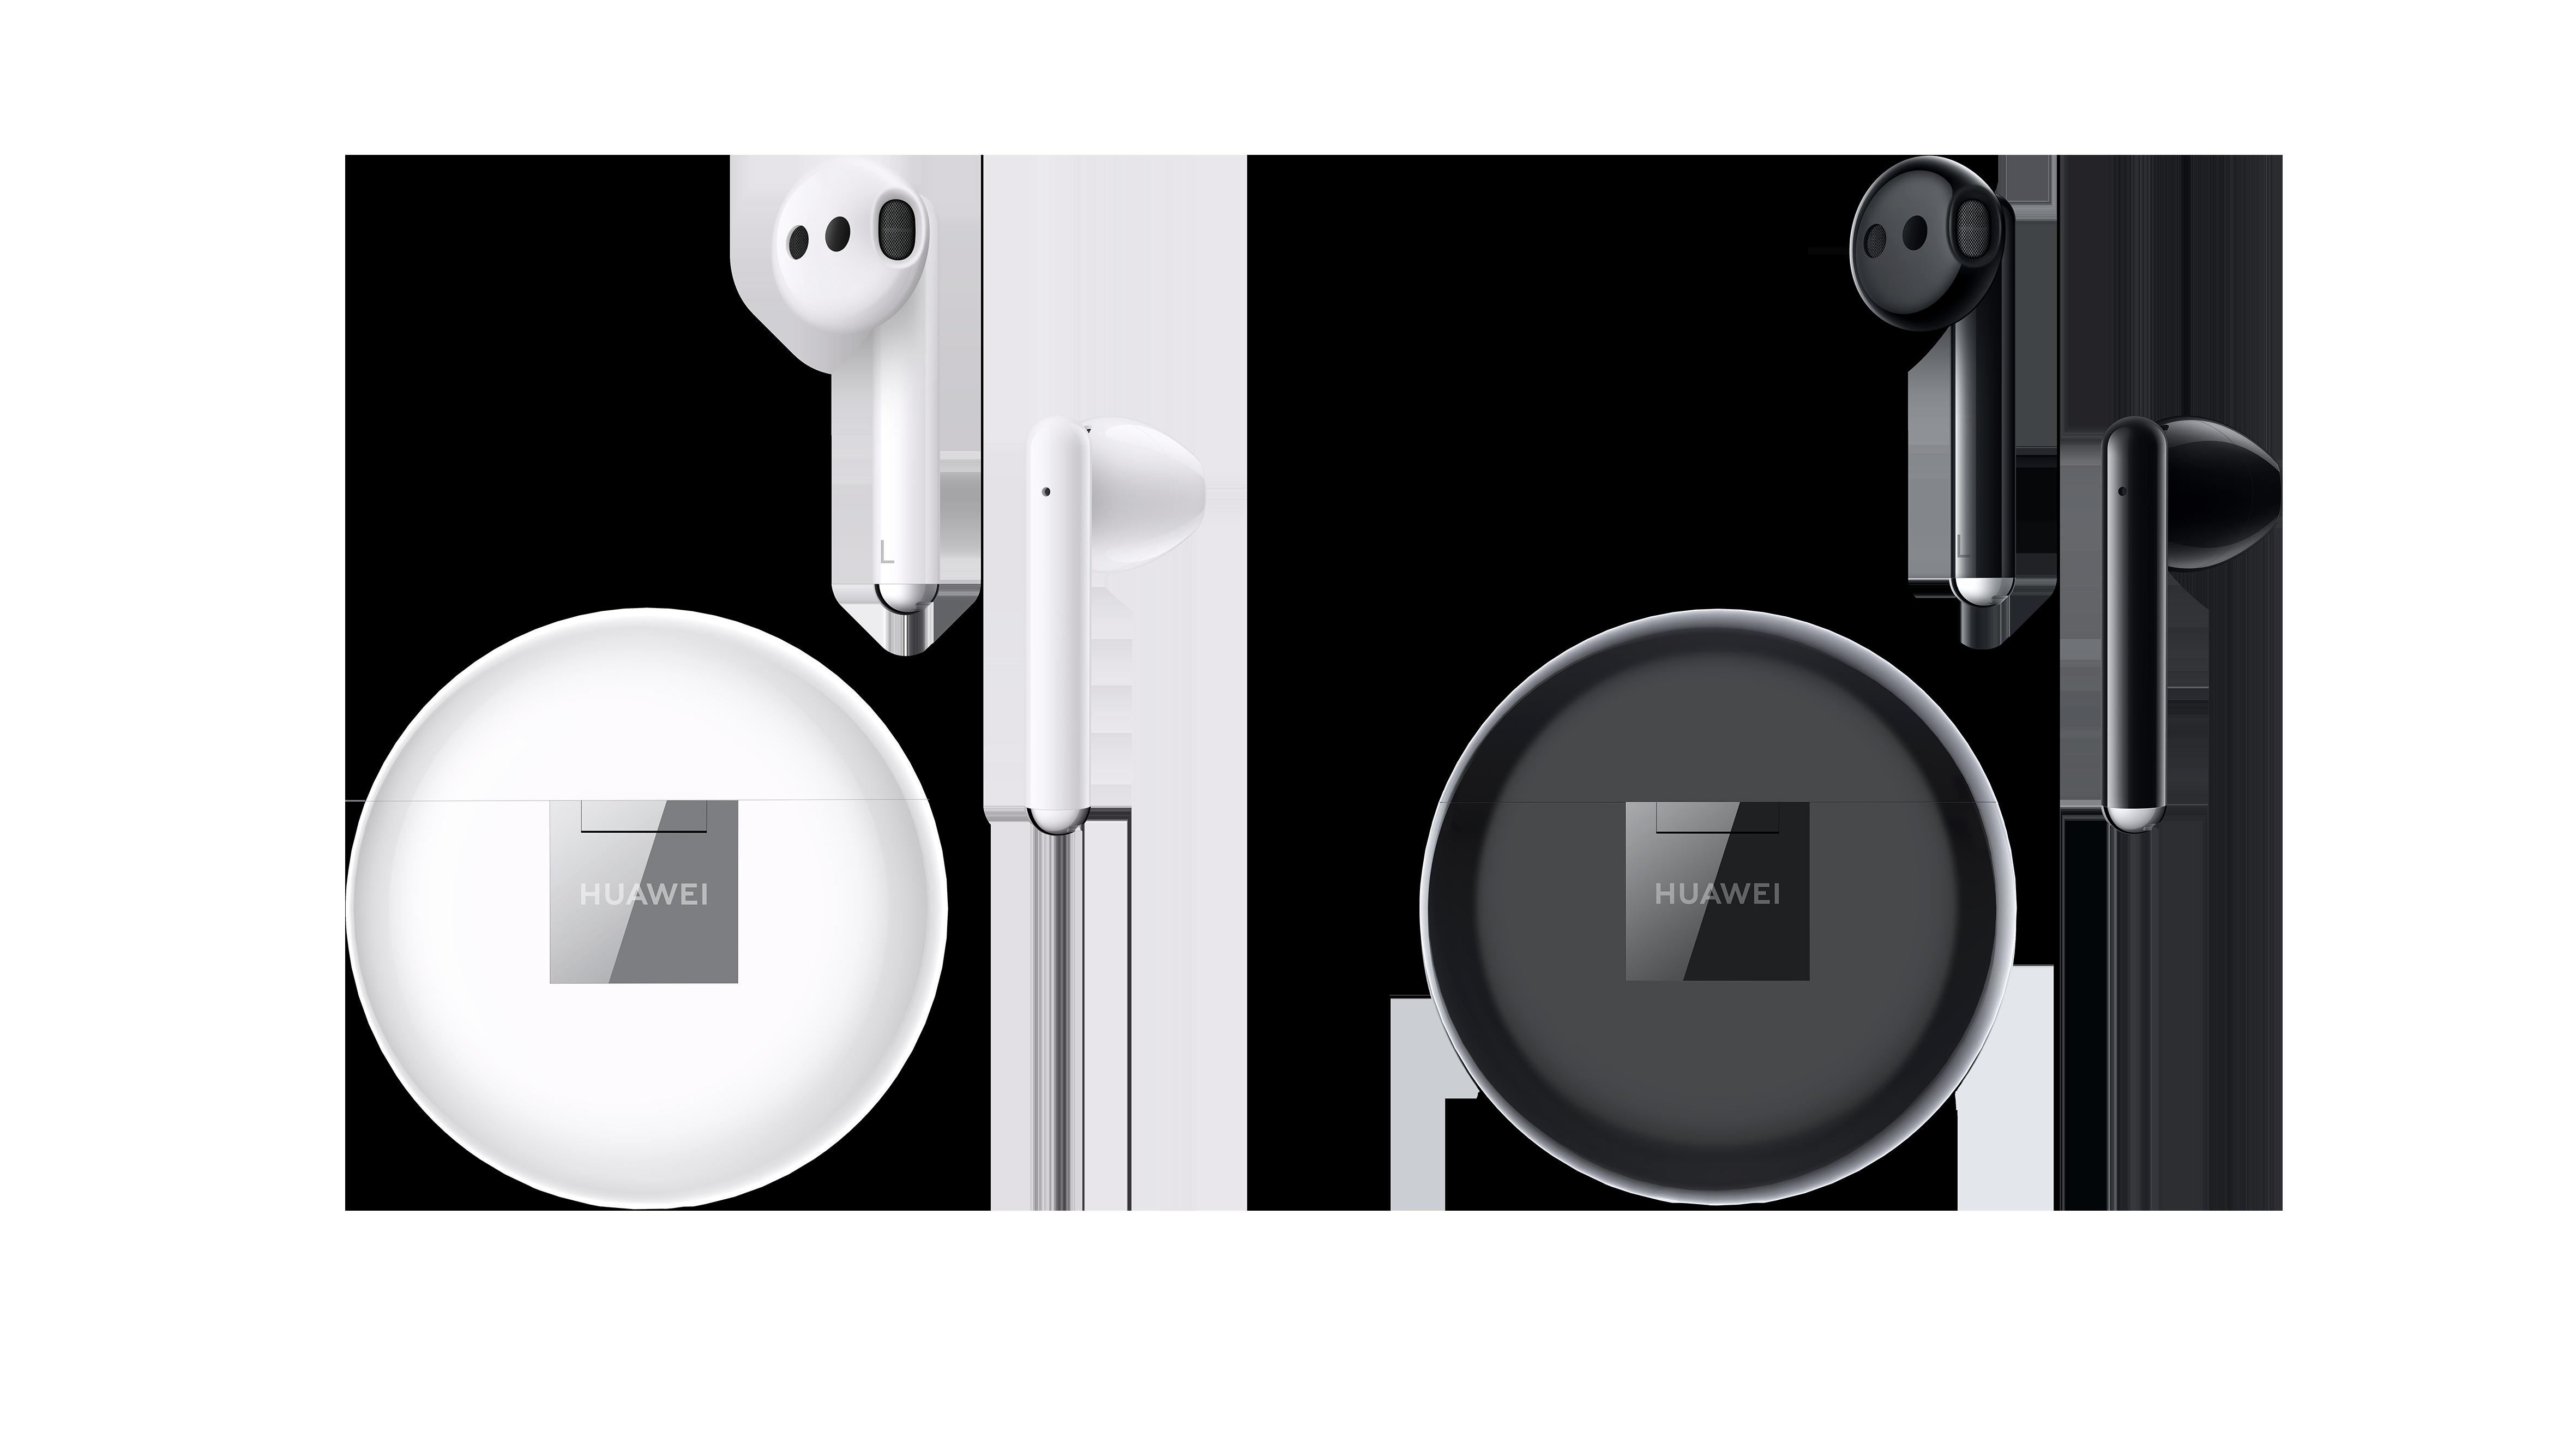 Freebuds 3: Huaweis Bluetooth-Hörstöpsel im Airpods-Stil mit ANC - Freebuds 3 (Bild: Huawei)